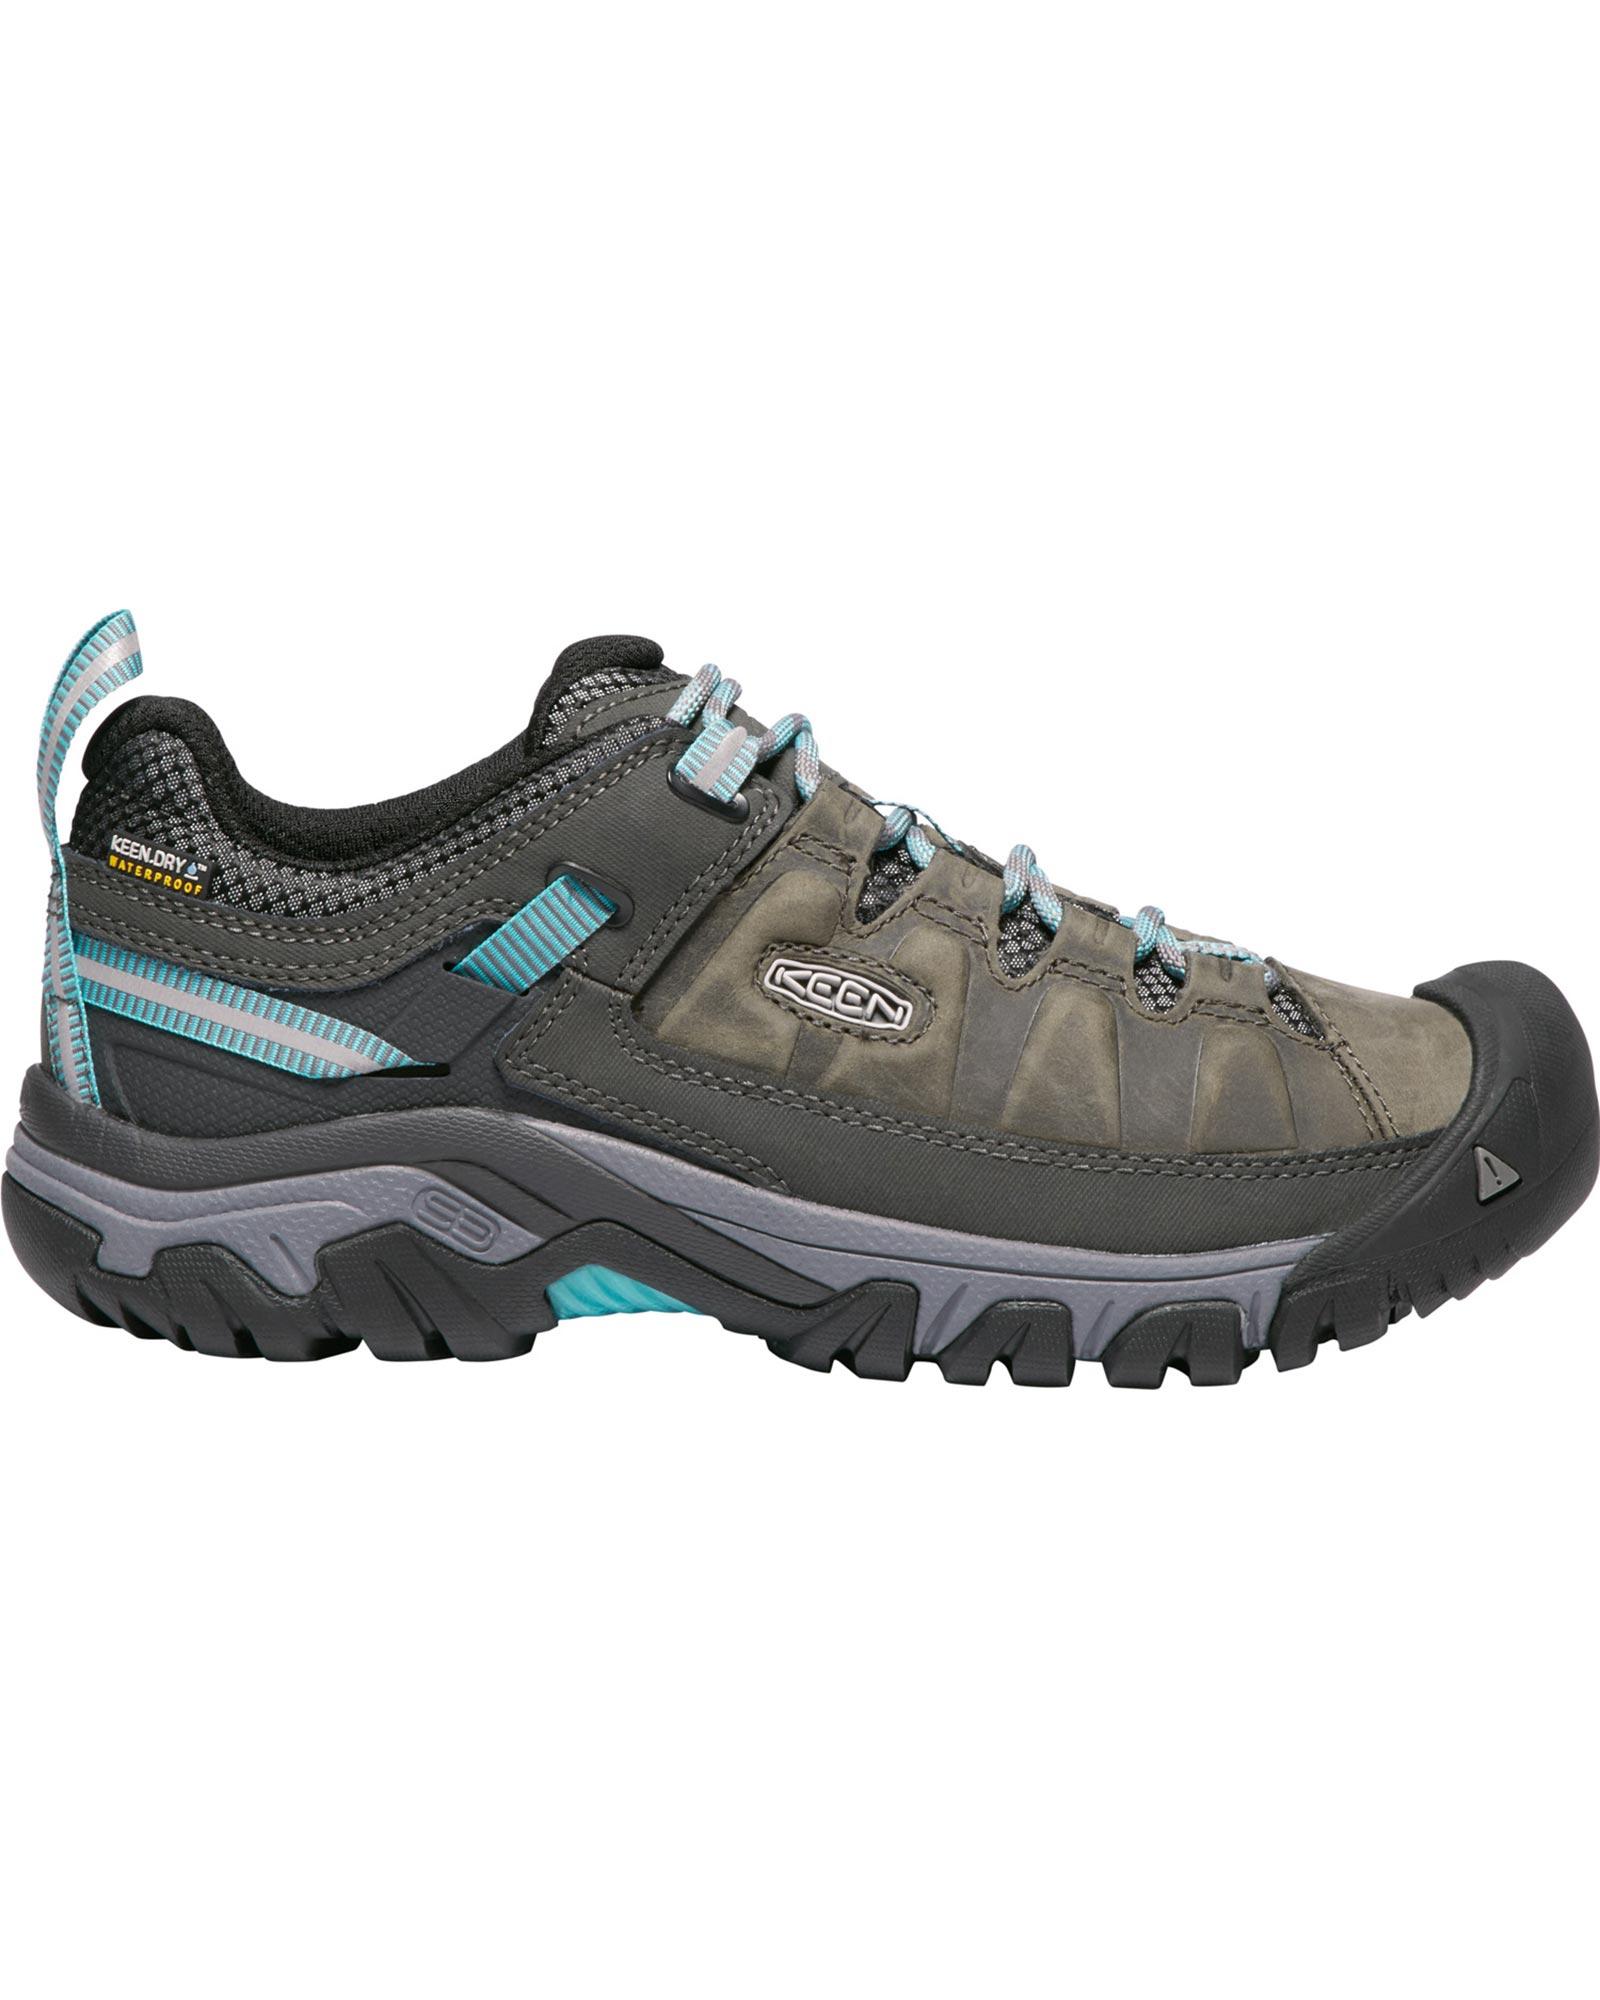 Product image of Keen Women's Targhee III Low Waterproof Walking Shoes